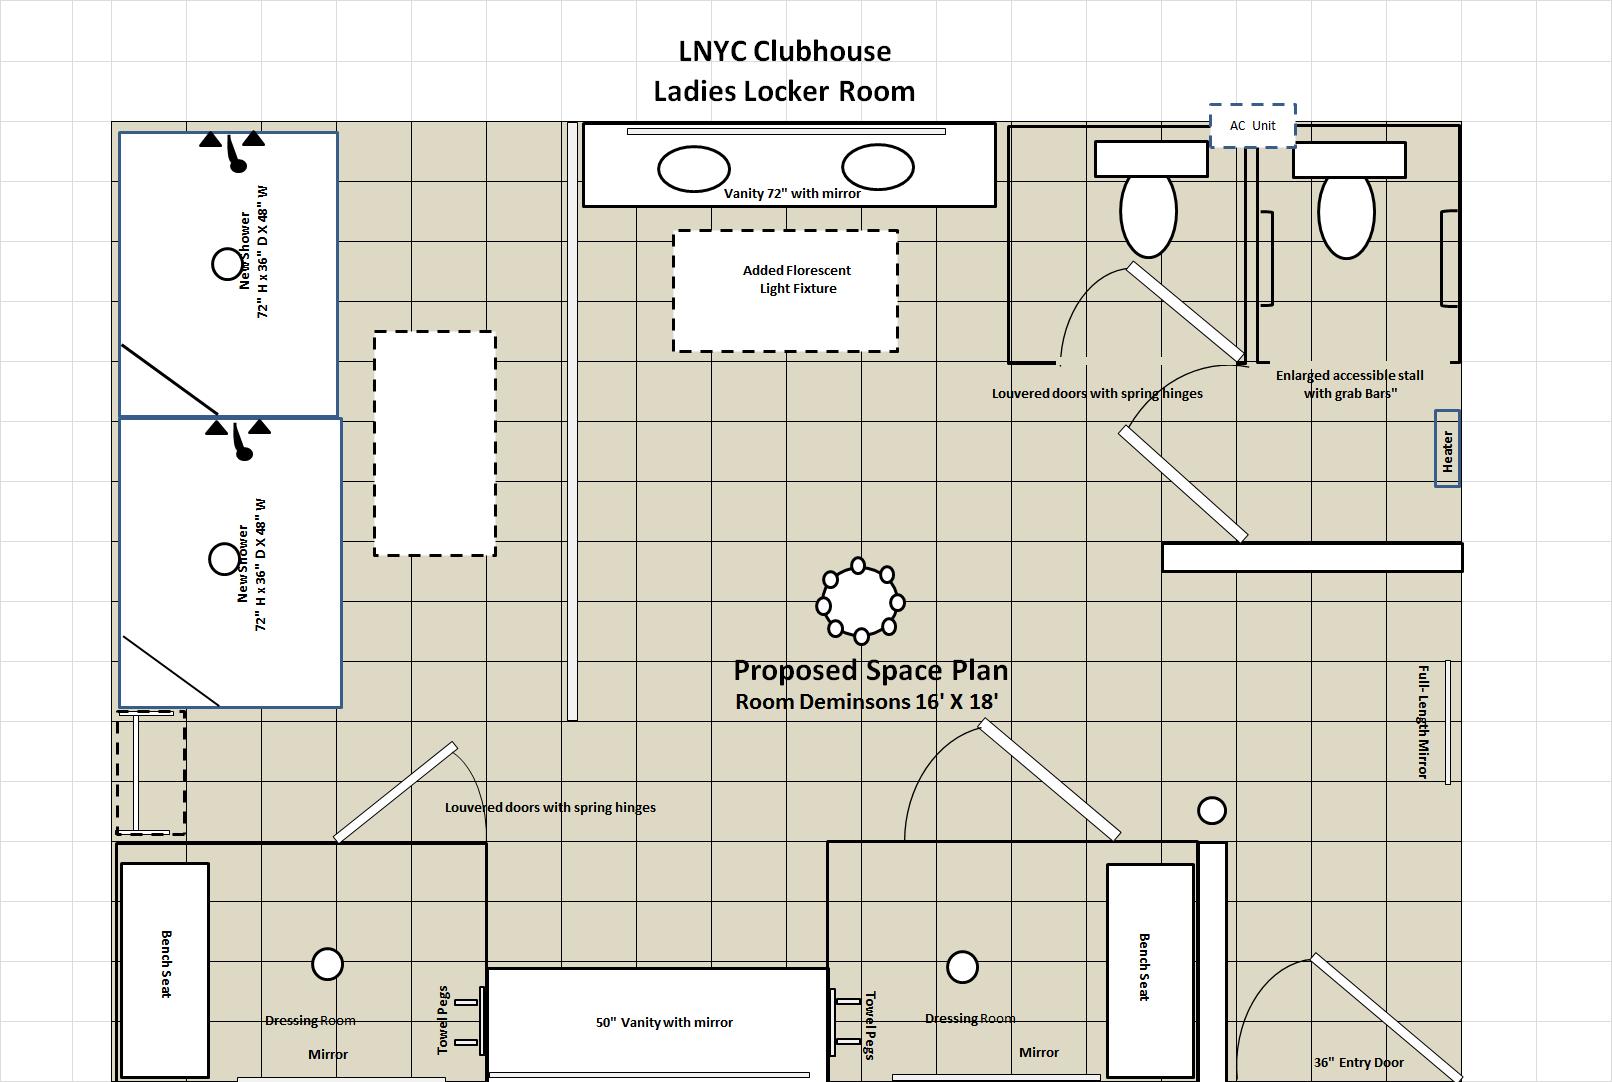 Plan floor tile layout